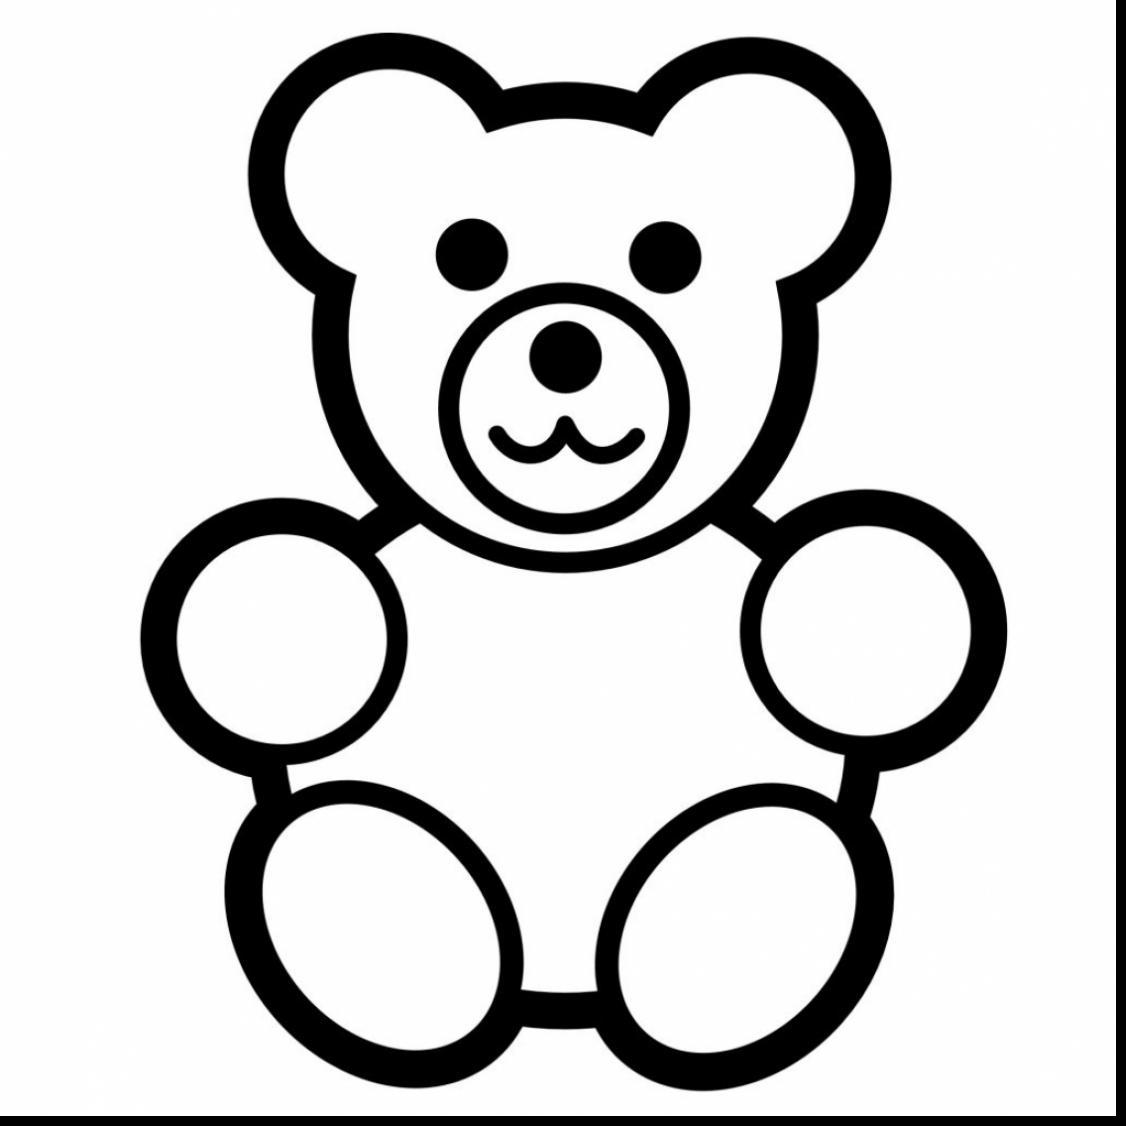 1126x1126 Beautiful Teddy Bear Clip Art Black And White With Teddy Bear